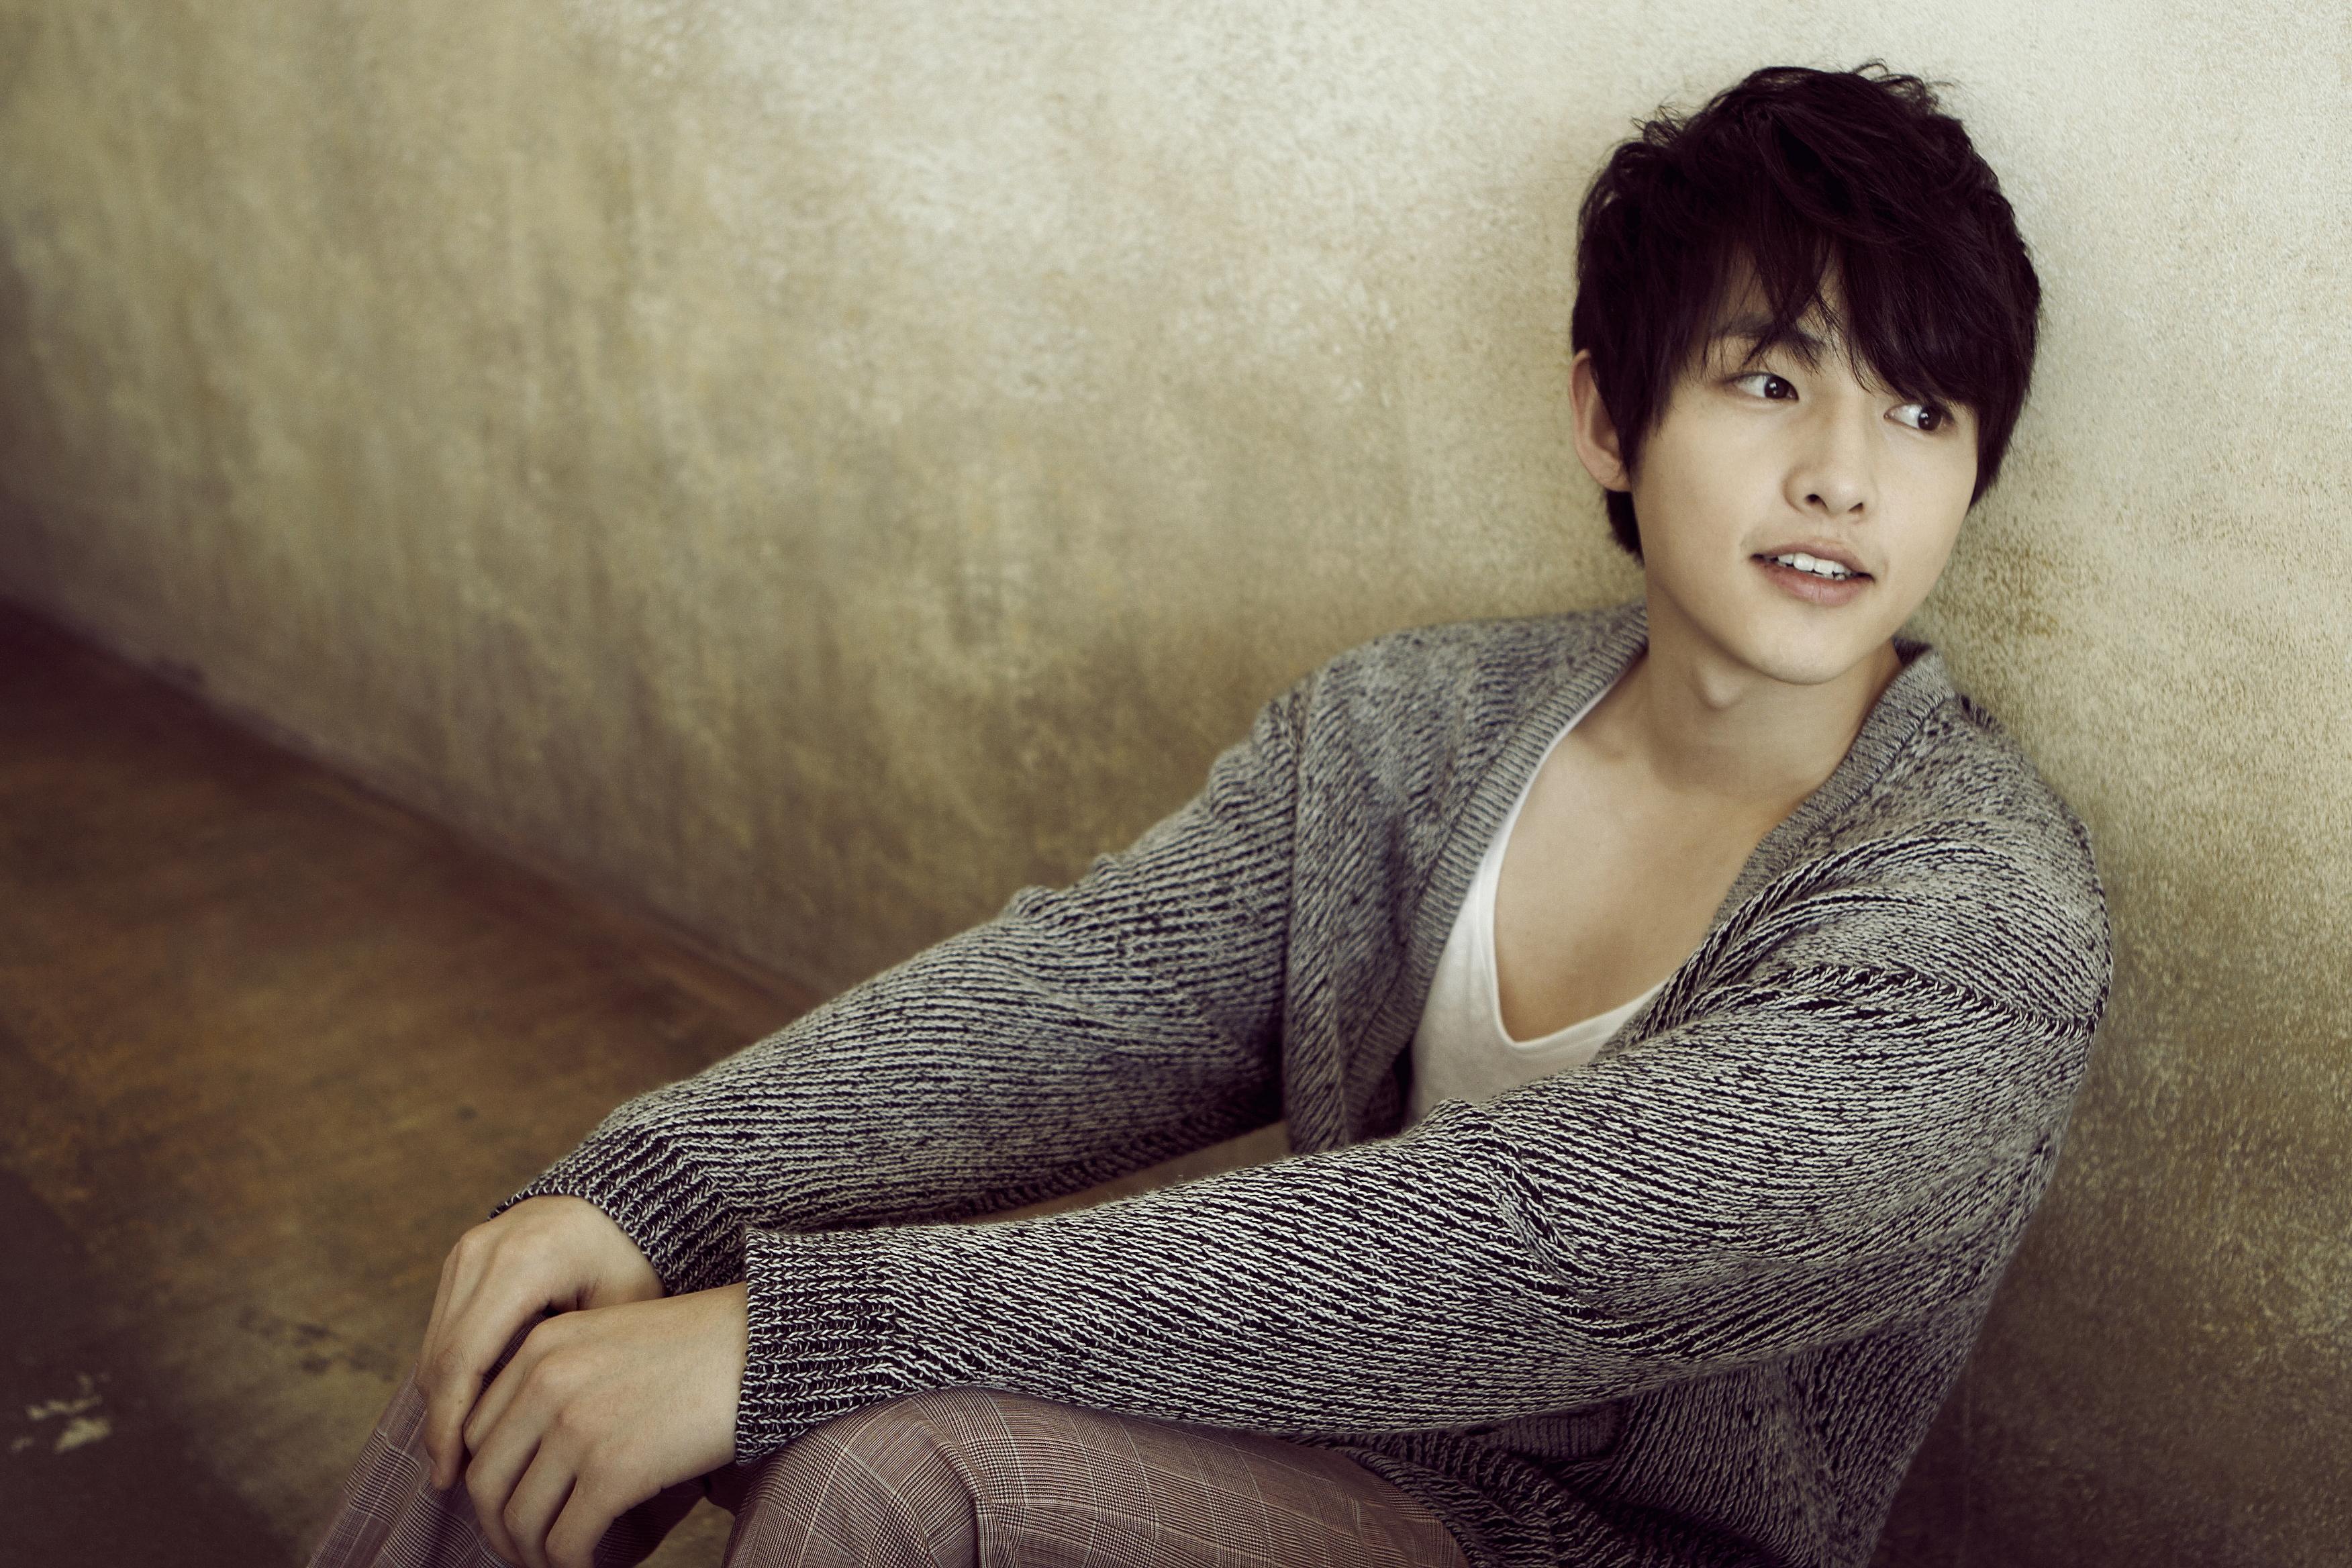 Song Joong Ki Hd Wallpaper